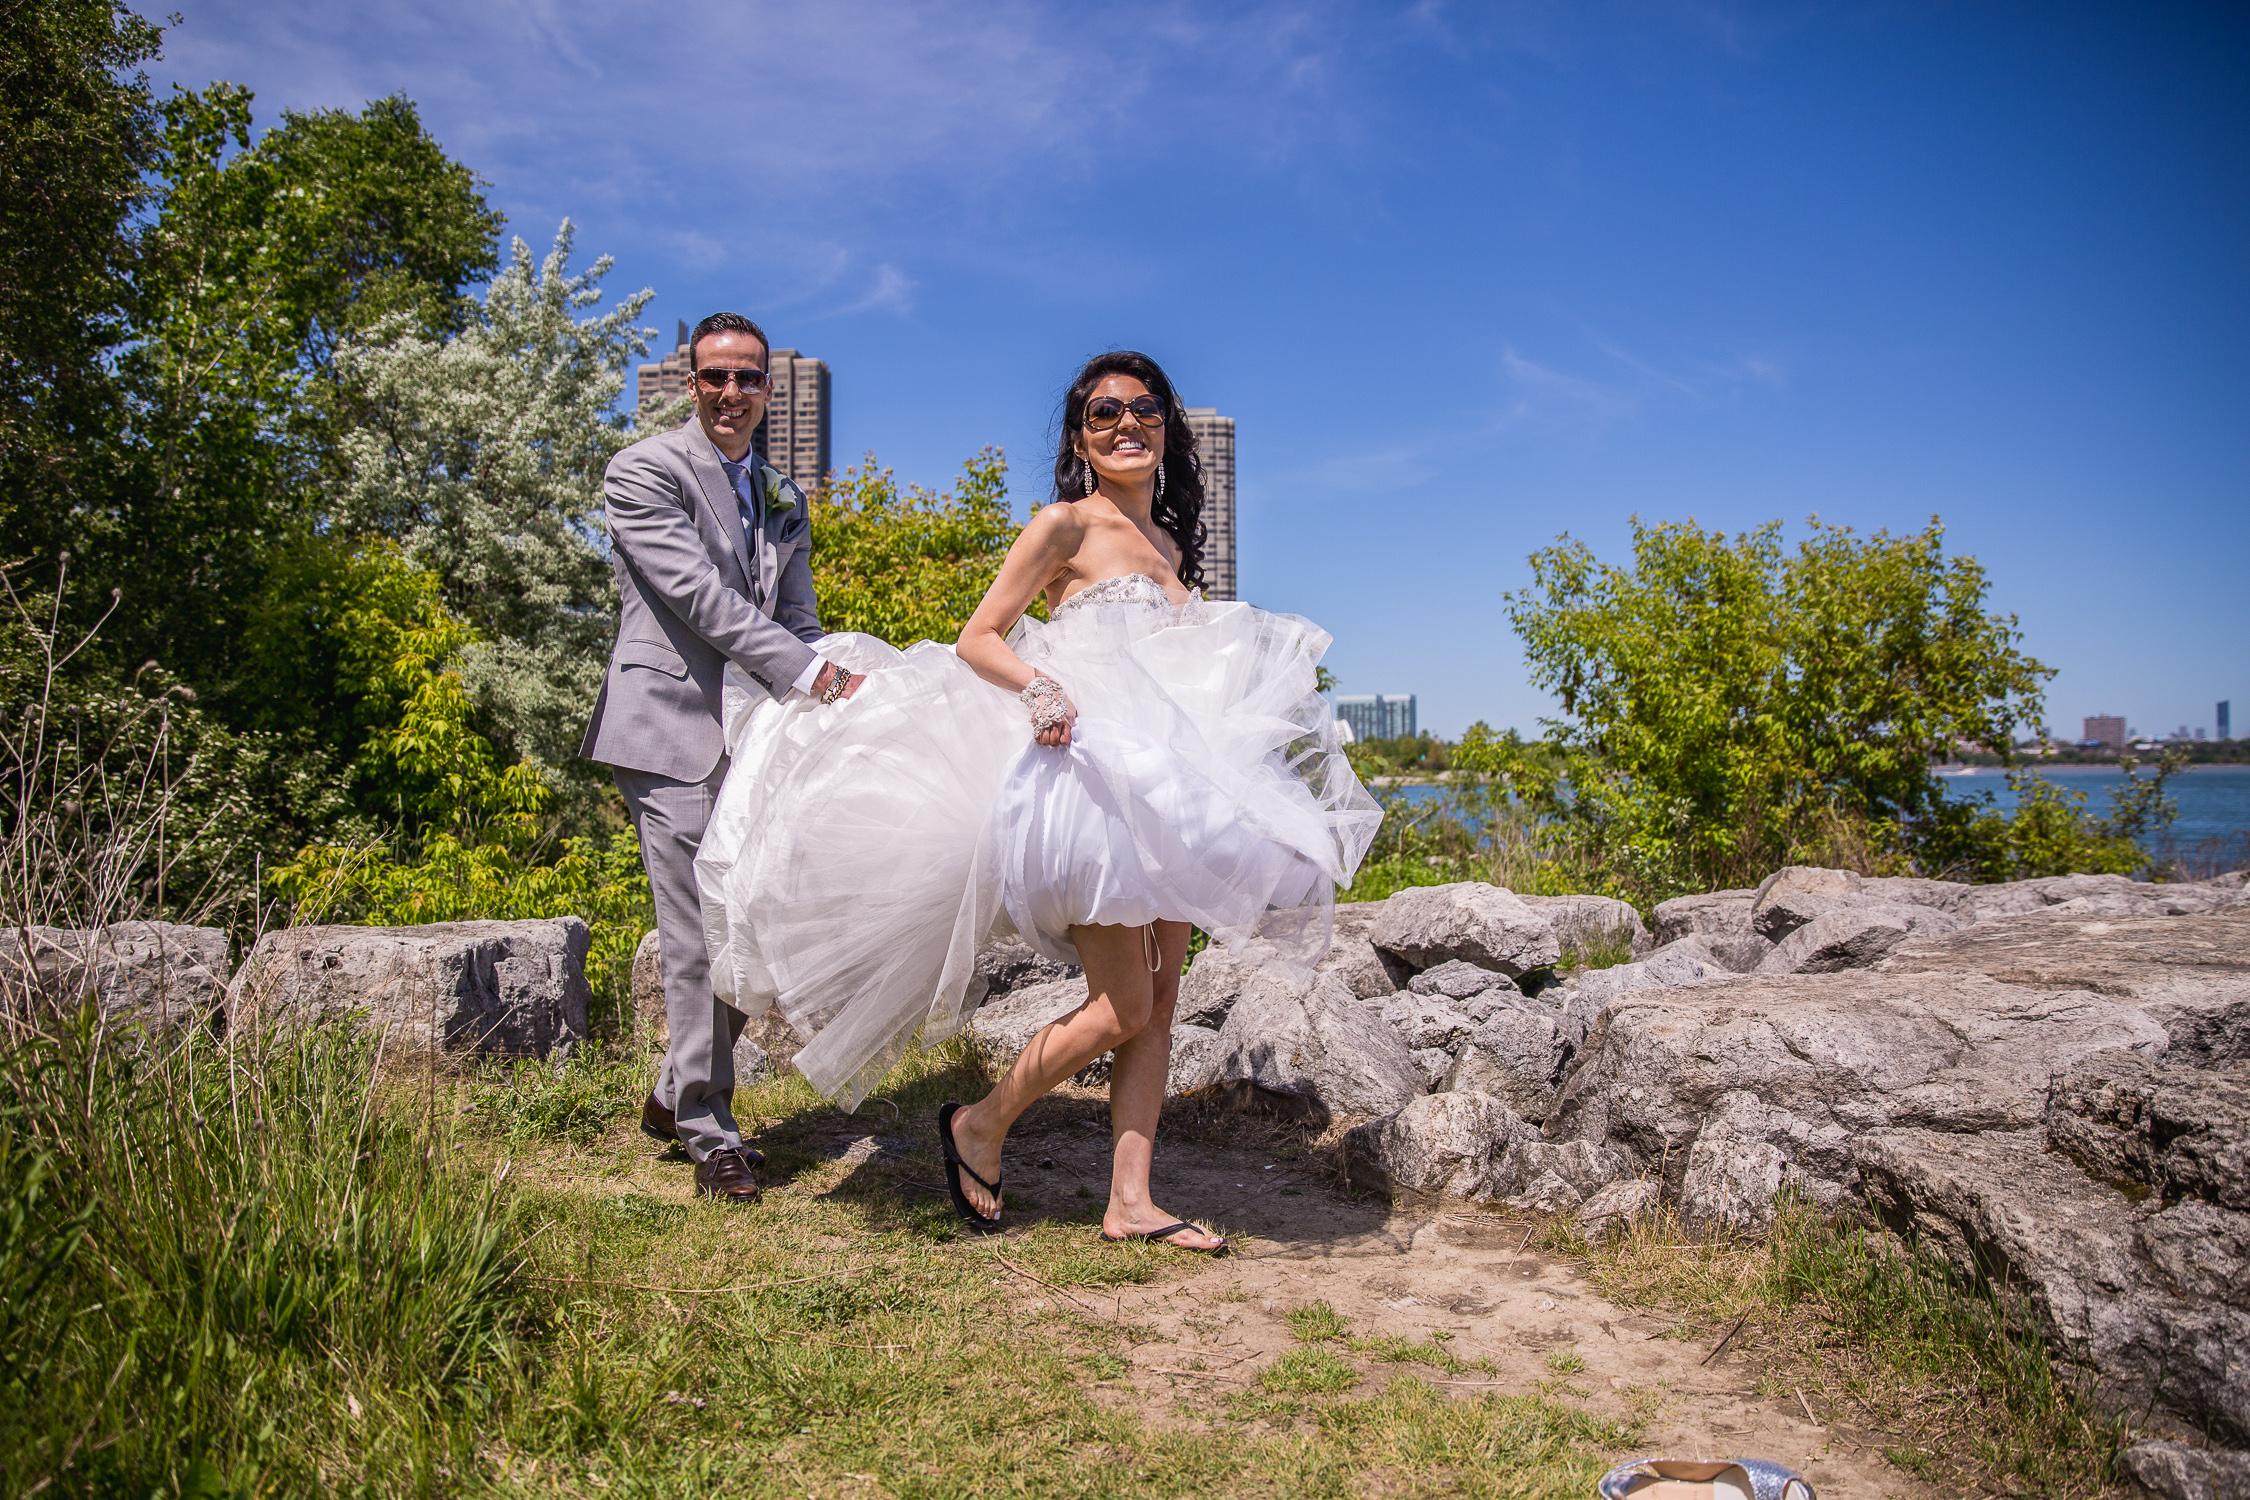 Paradise-Banquet-Hall-Wedding-Vaughan-Ontario-0058.jpg